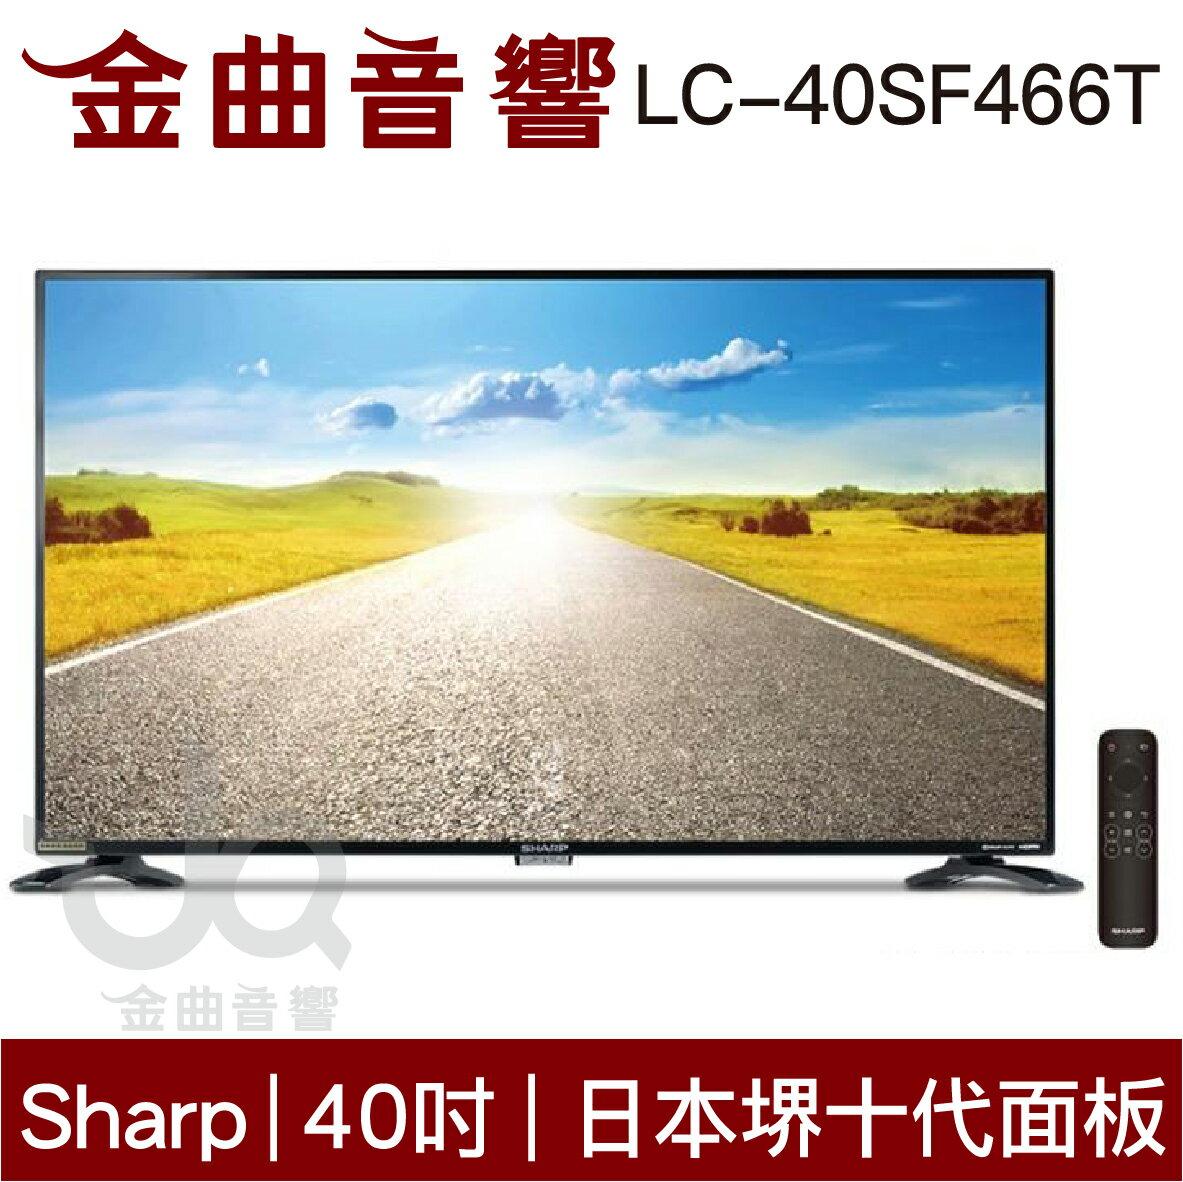 SHARP 夏普 40型 FHD智慧連網顯示器(含視訊盒) LC-40SF466T   金曲音響